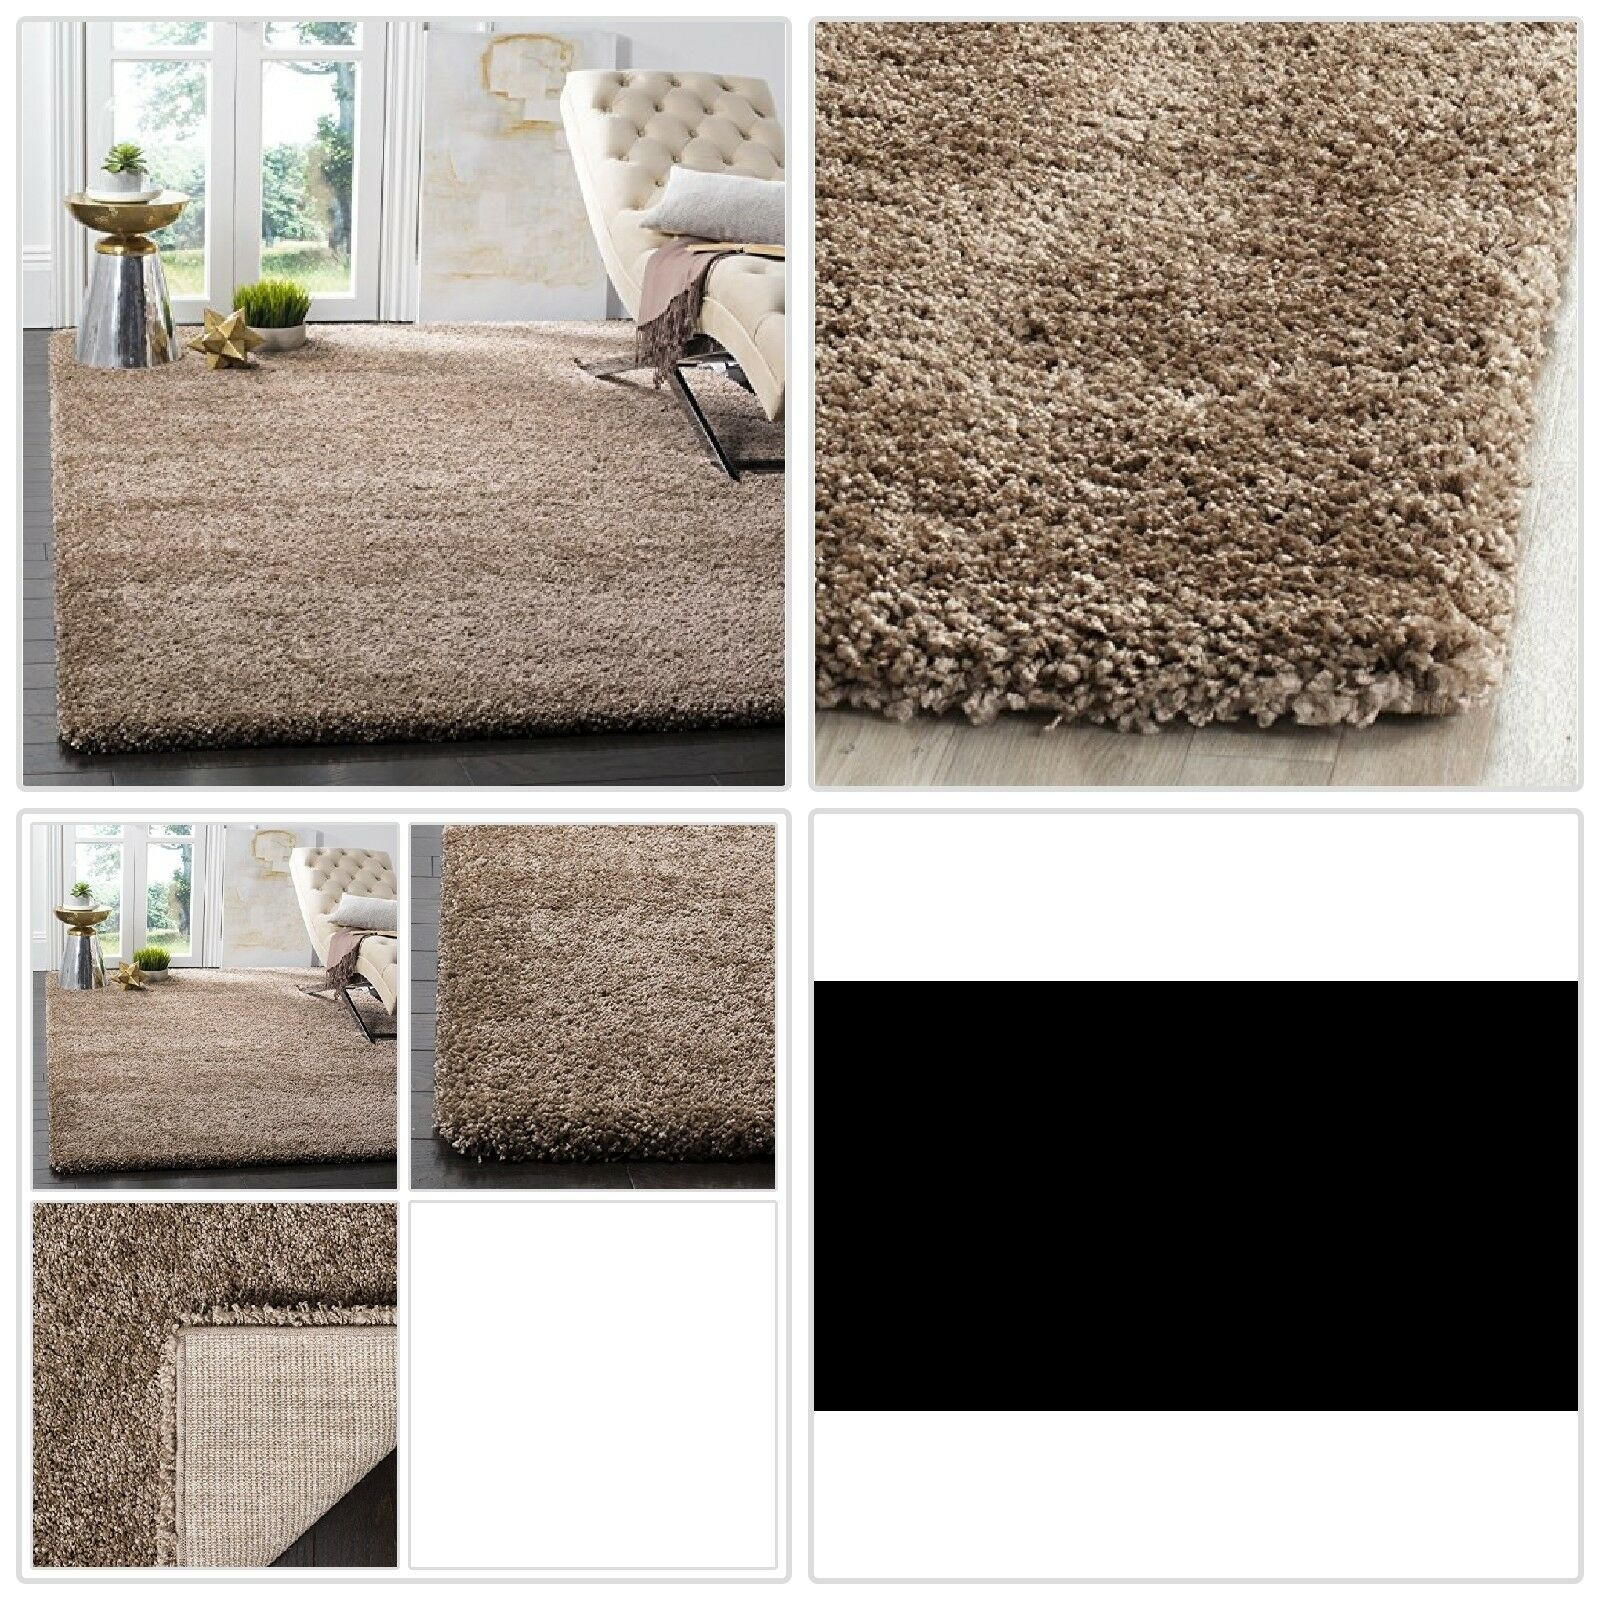 Cozy Shag Modern Soft Fluffy Solid Area Rugs Shaggy Home Bedroom Carpet Floor